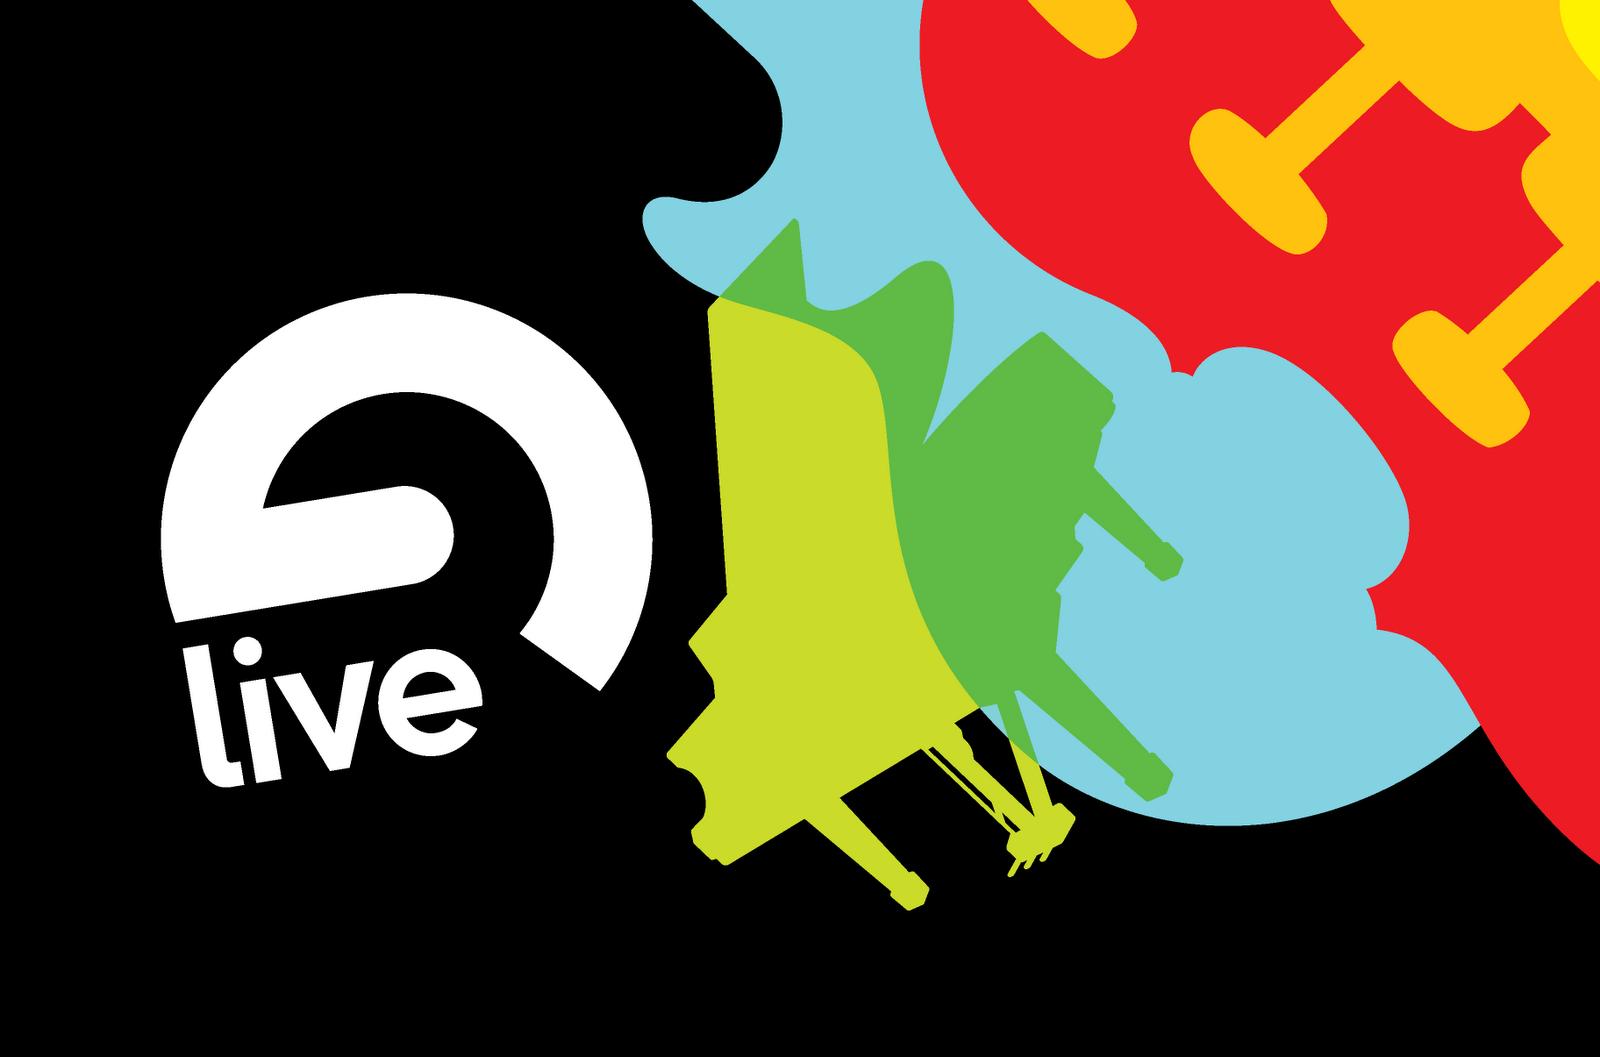 logo wallpaper ableton live logo ableton live logo wallpaper ableton 1600x1057